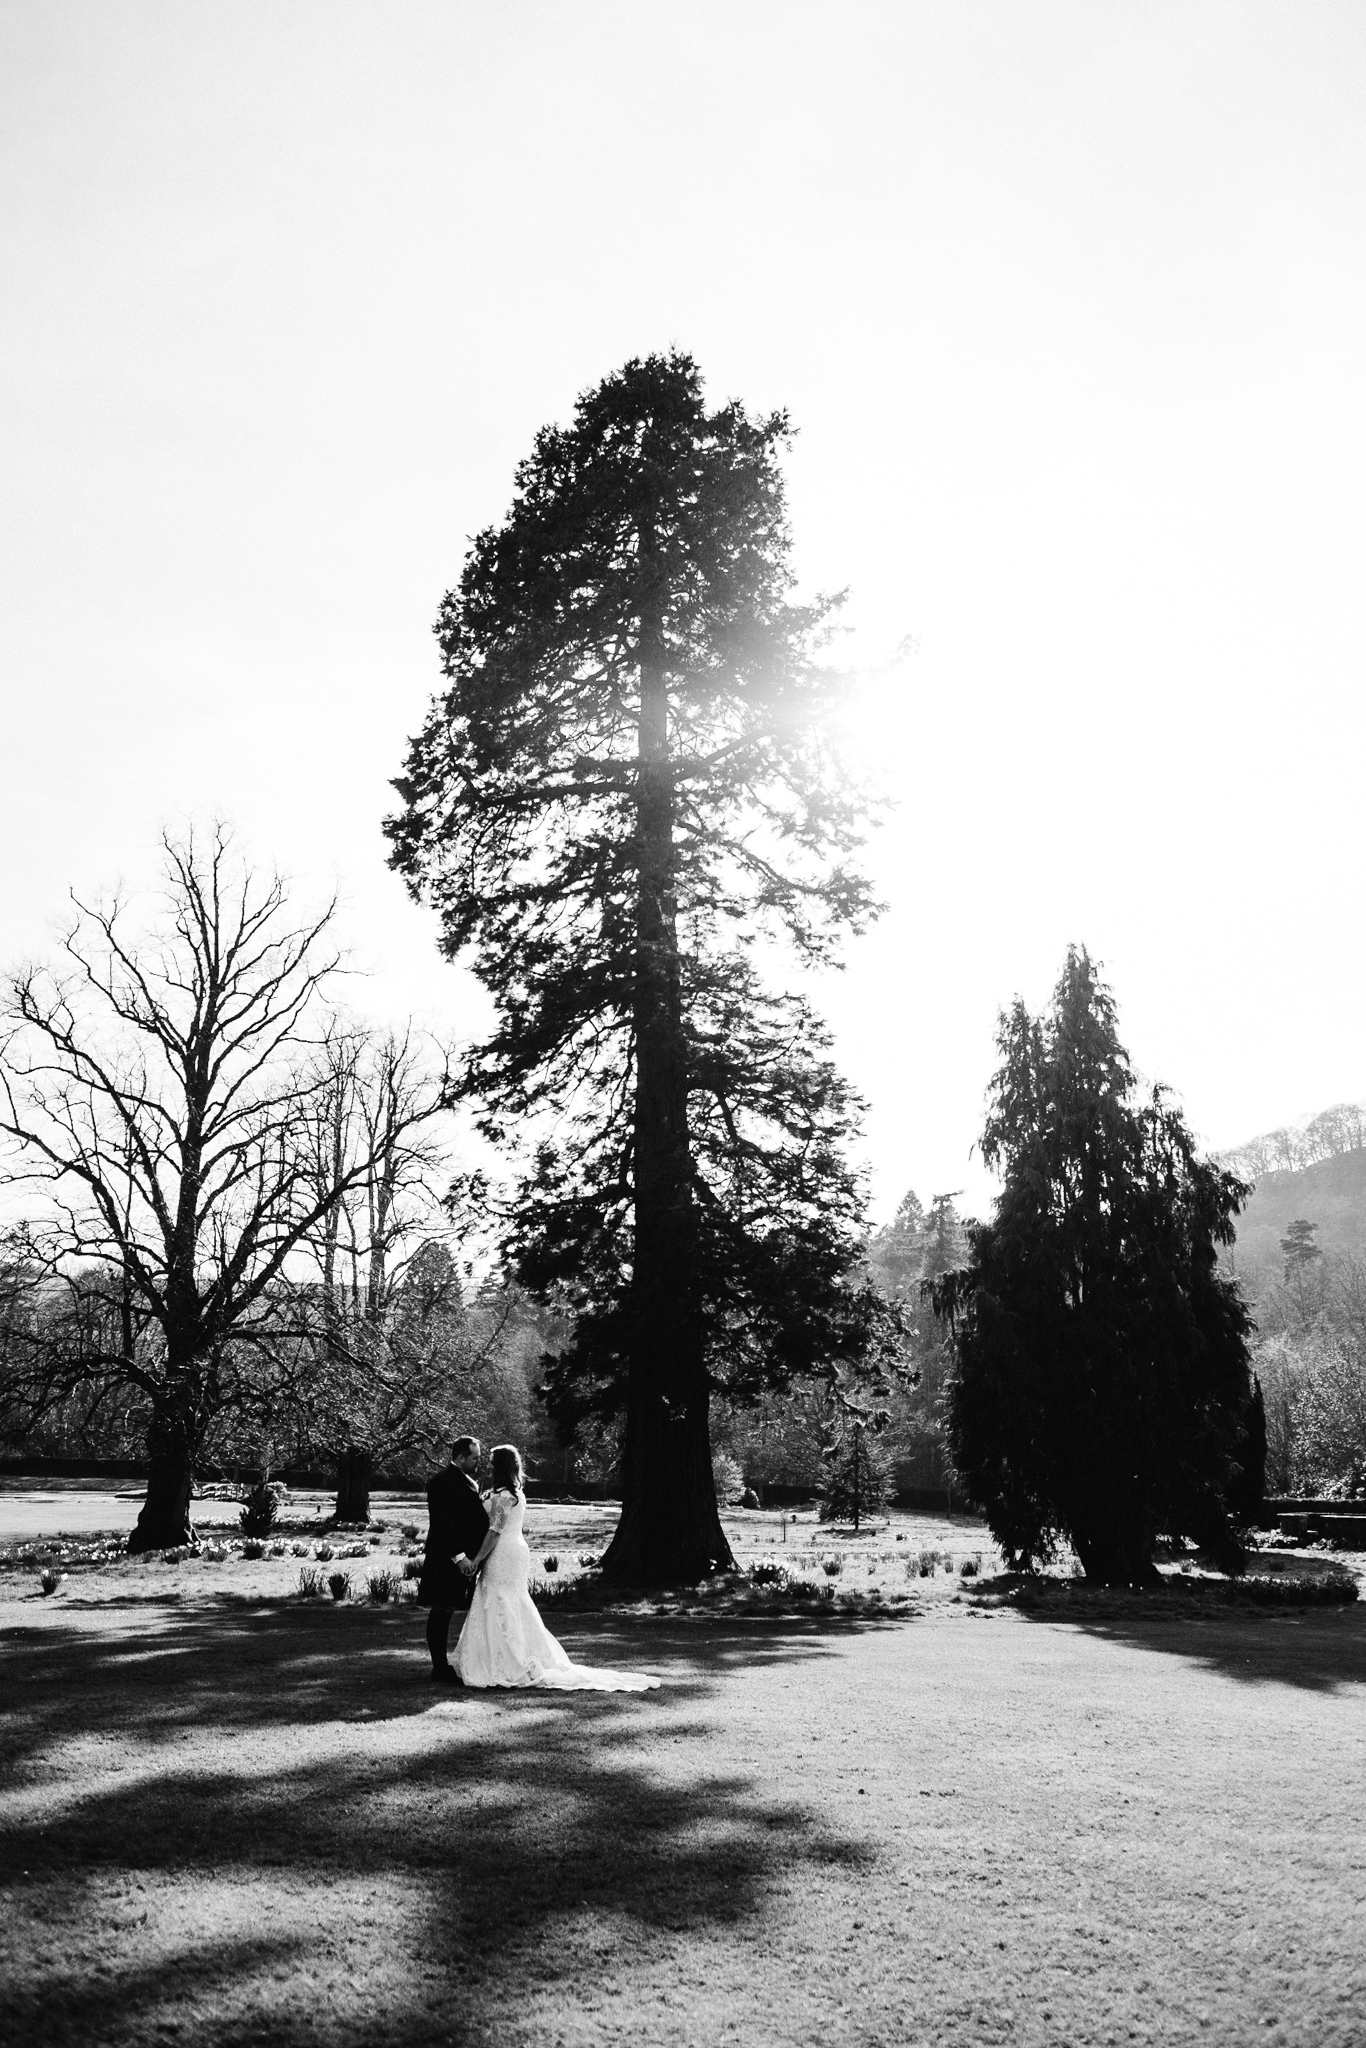 Scottish Castle Wedding_Duntreath Castle_Euan Robertson Photography_013.jpg